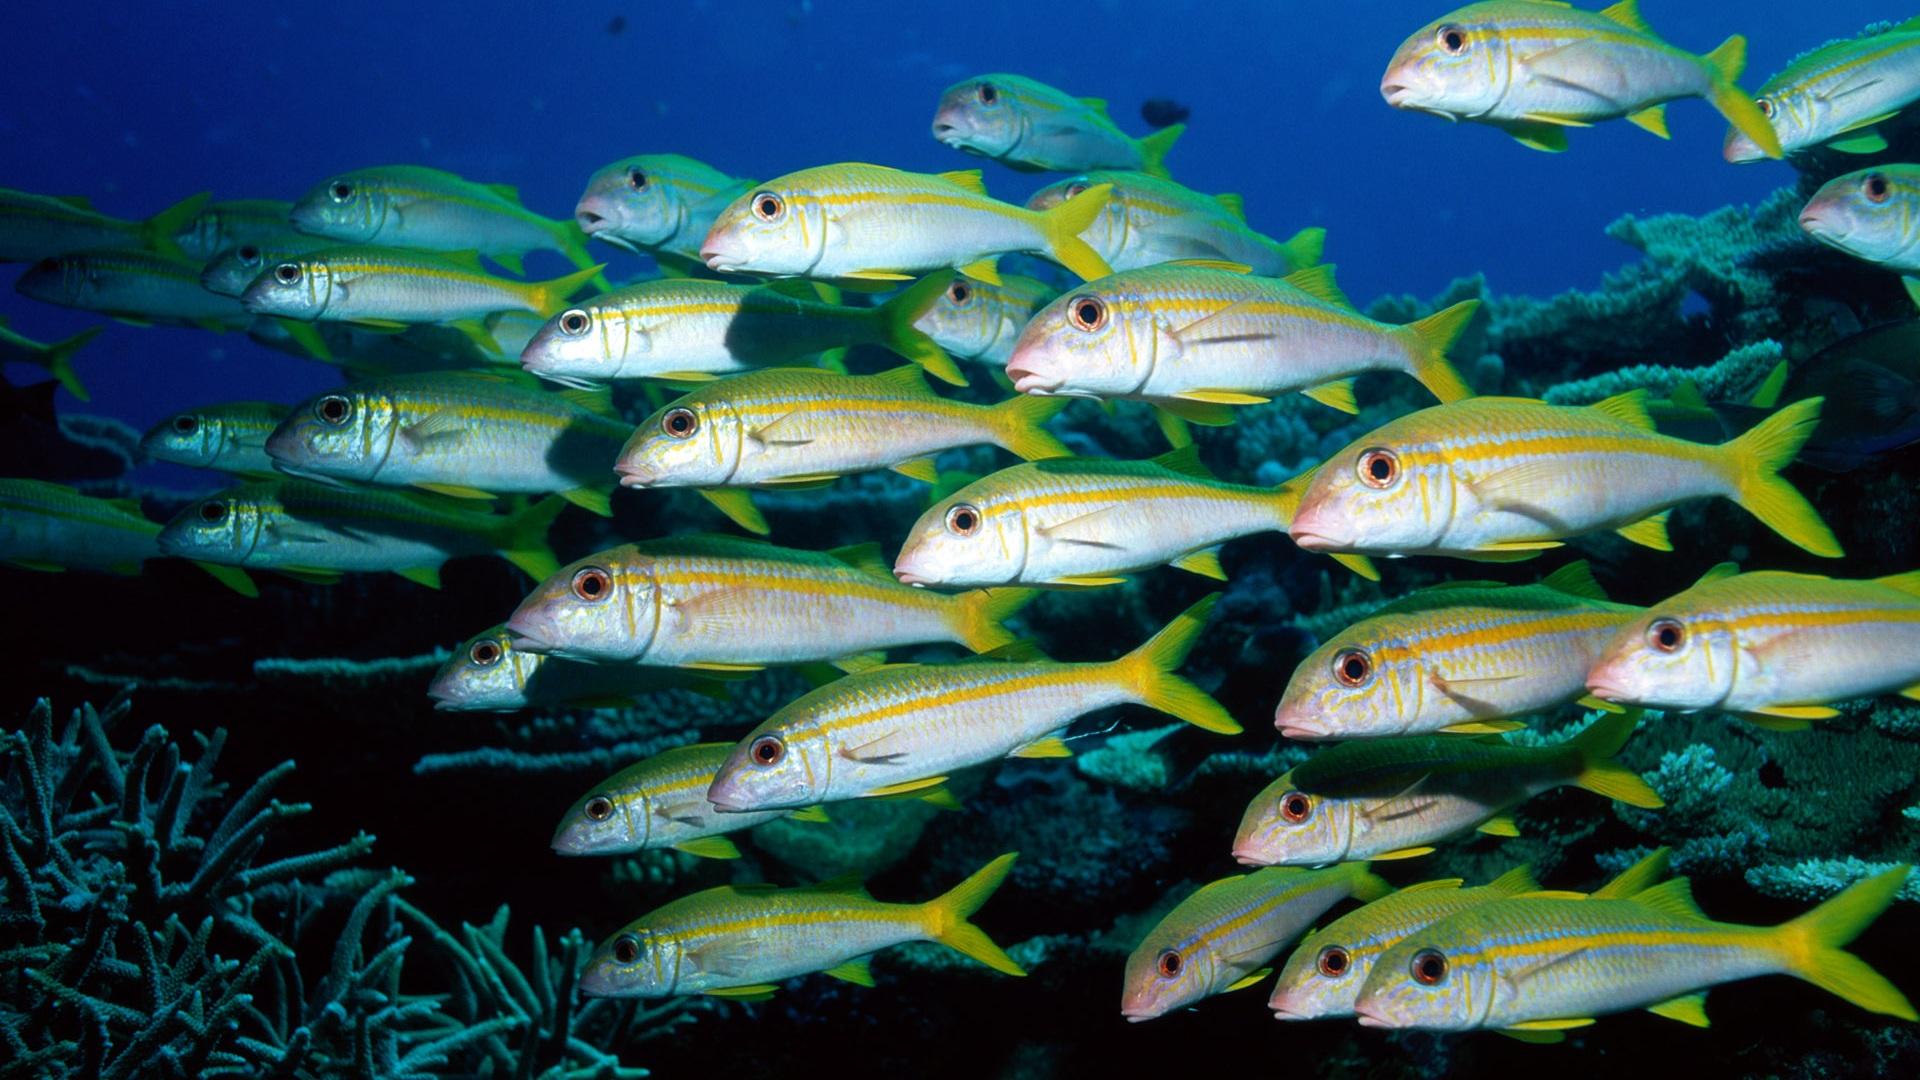 wallpaper groups of fish underwater world 1920x1200 hd